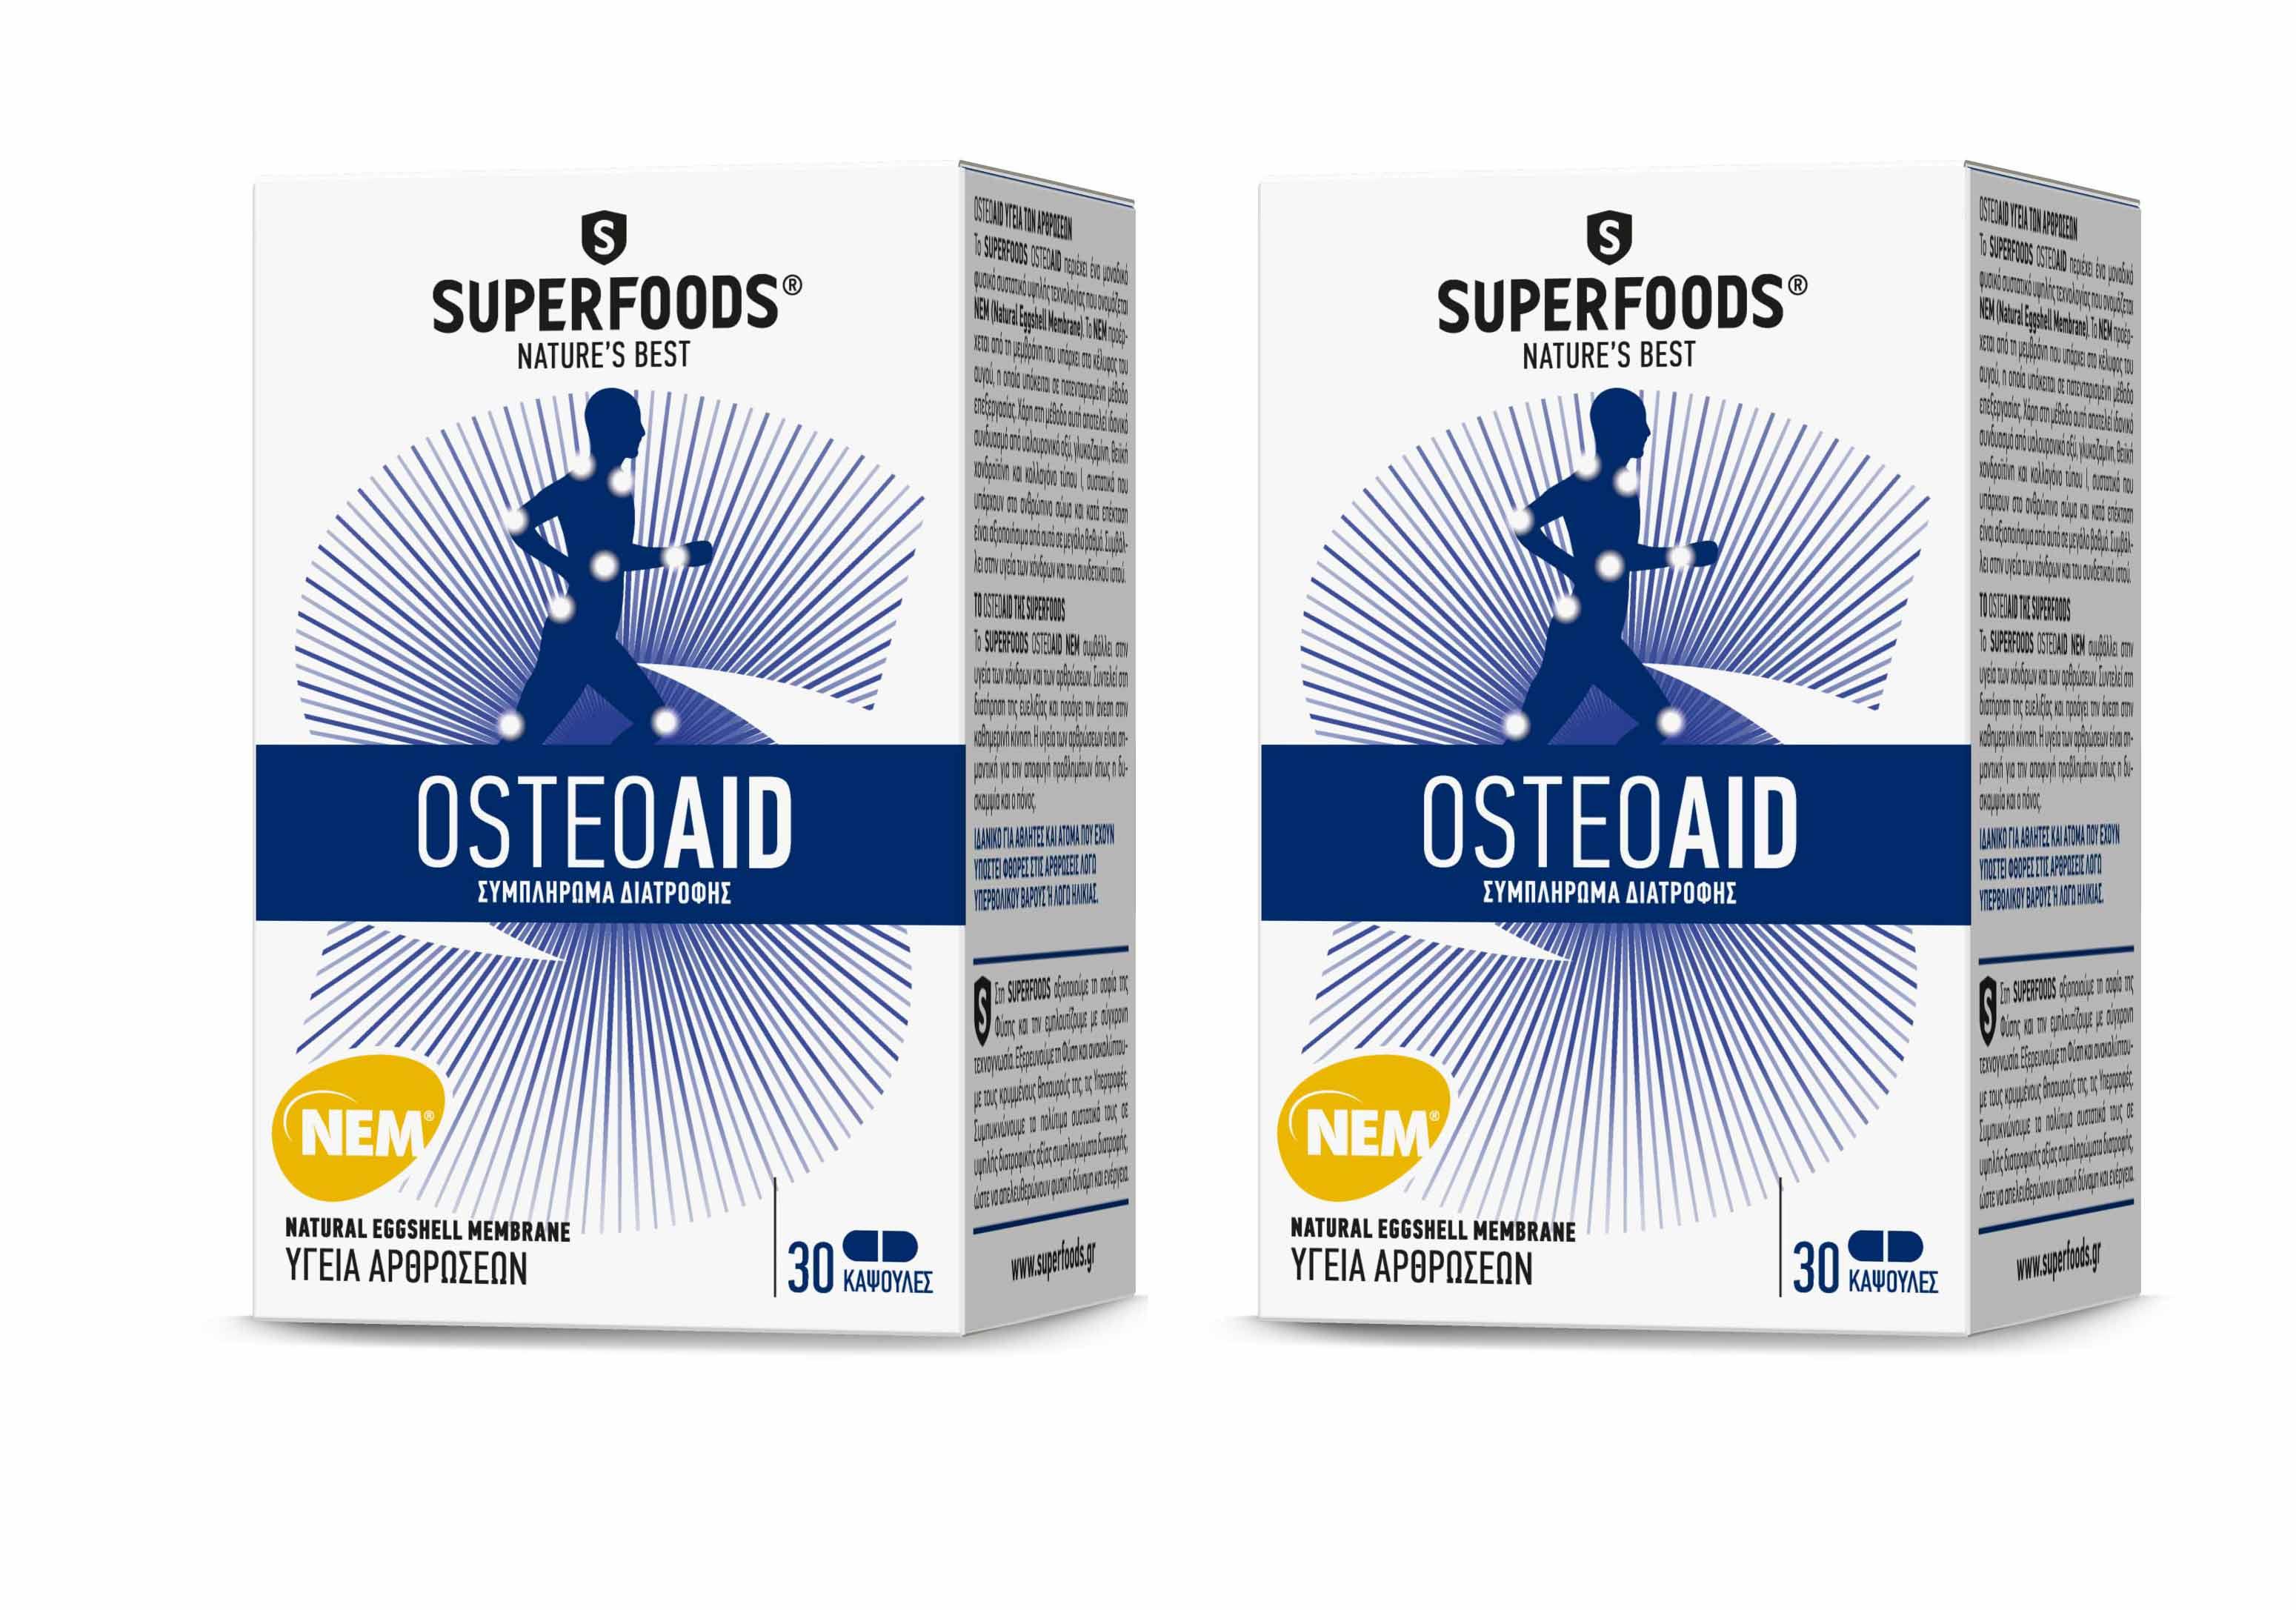 2x Superfoods Osteoaid Συμπλήρωμα Διατροφής για την υγεία των Αρθρώσεων, 2x 30caps